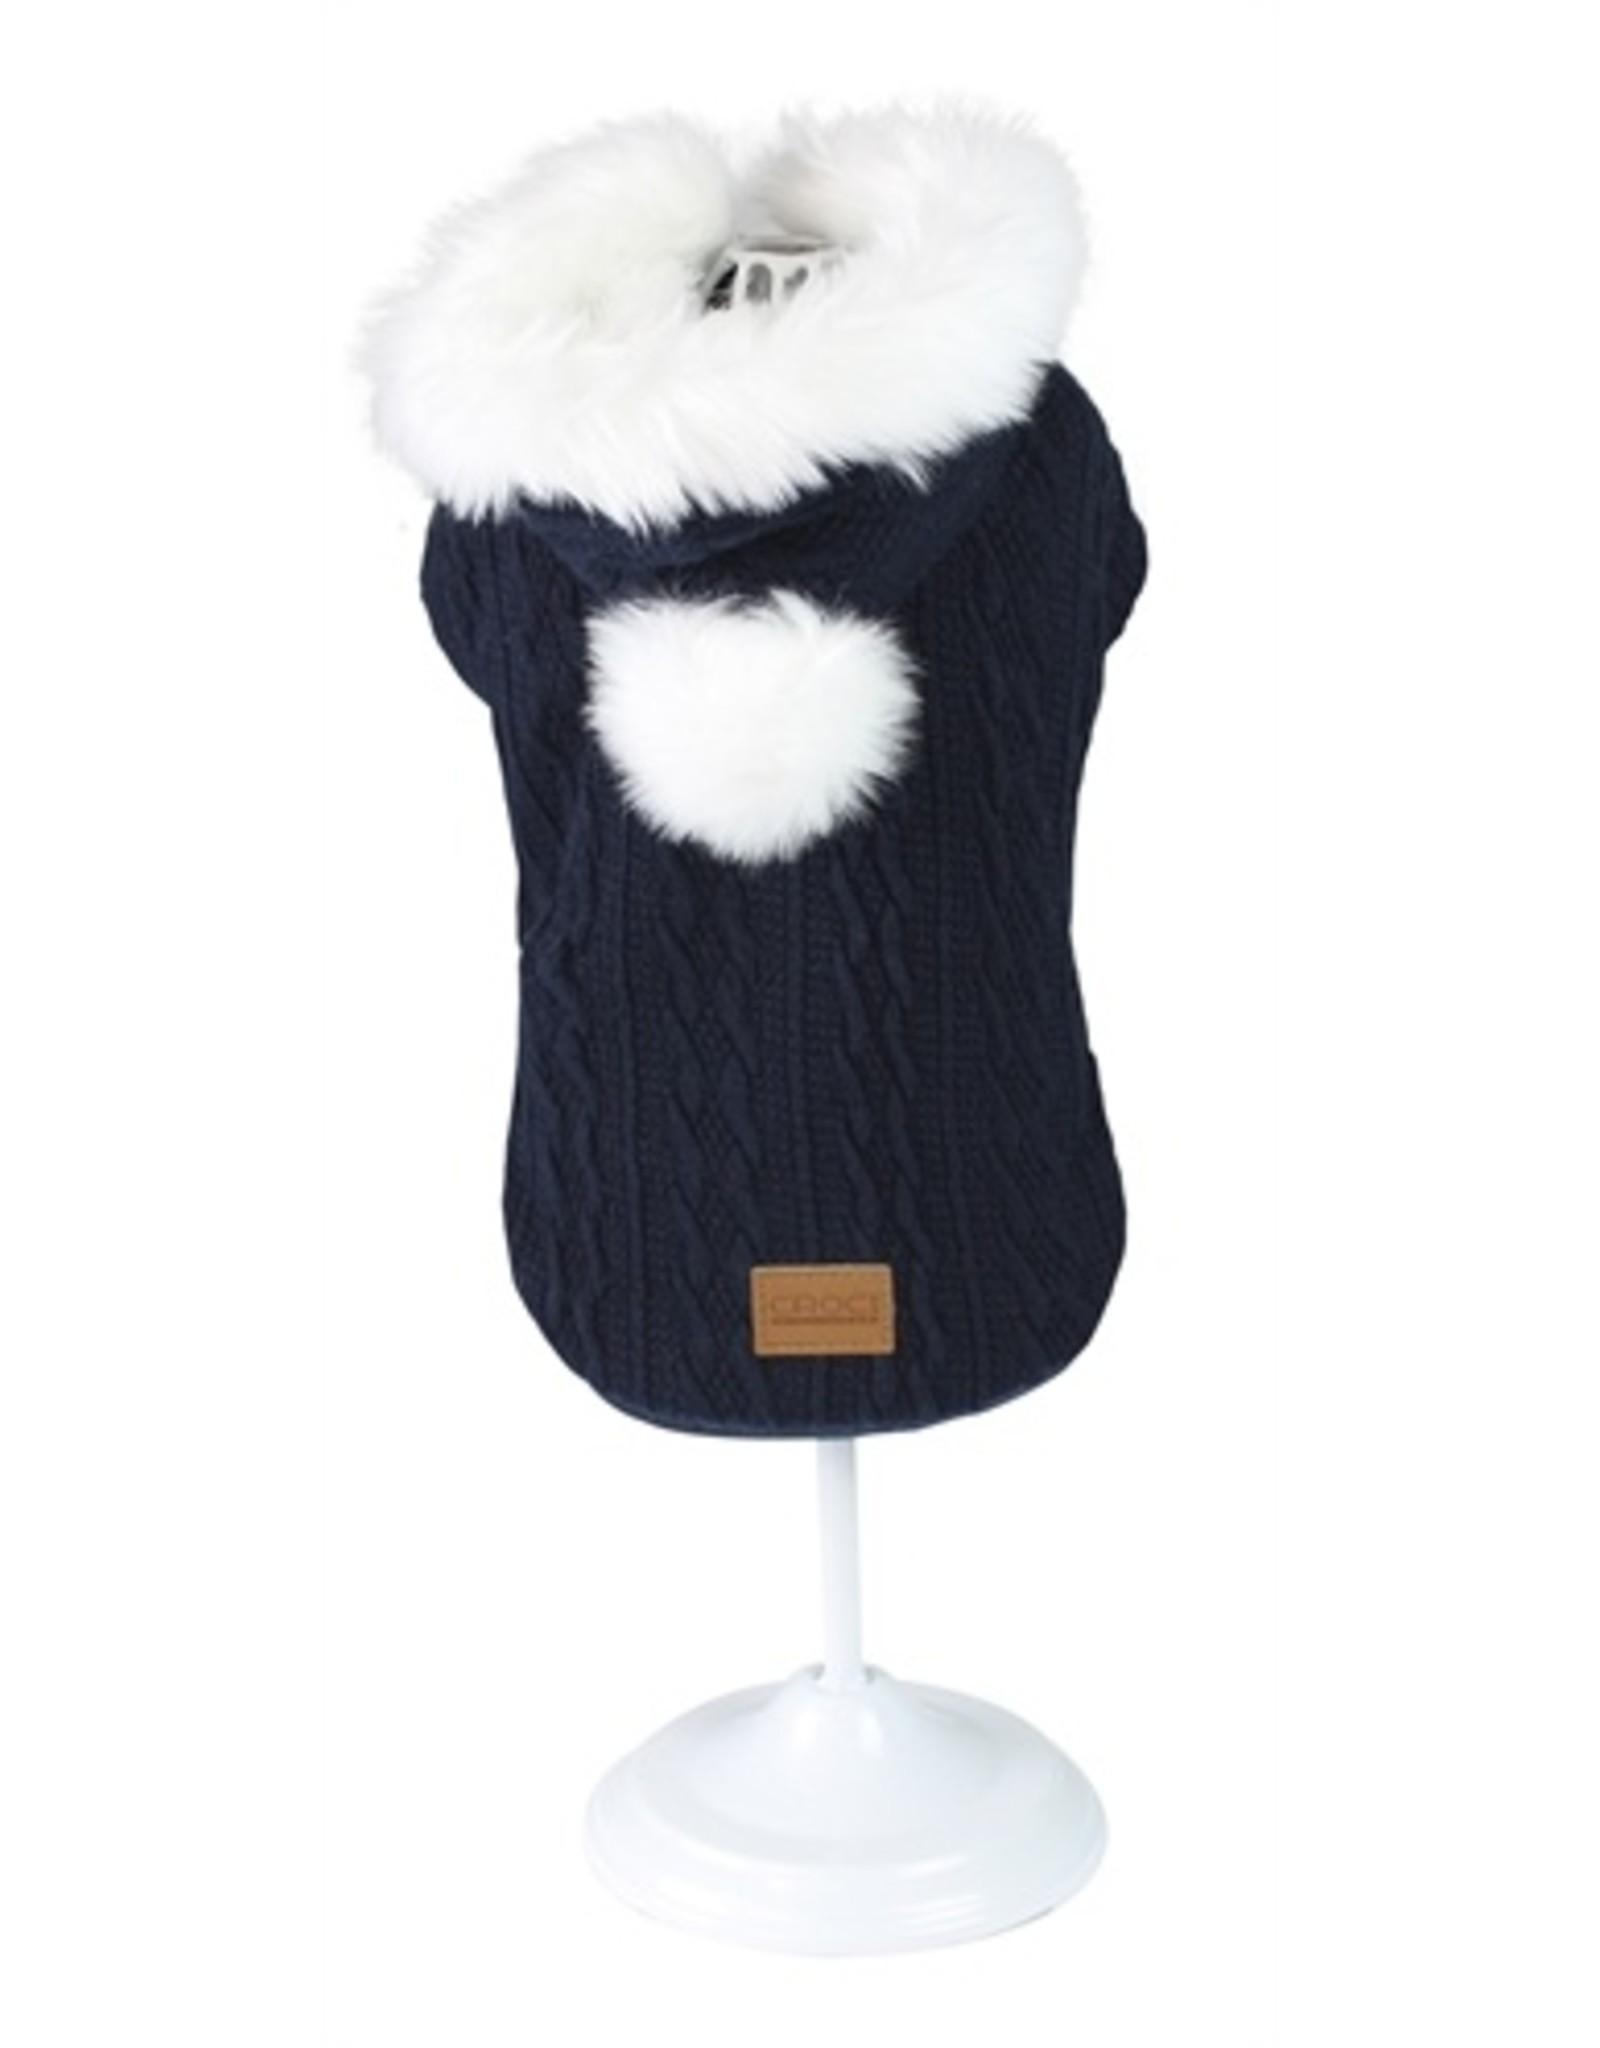 Croci Croci hondentrui sweater cushy blauw / wit